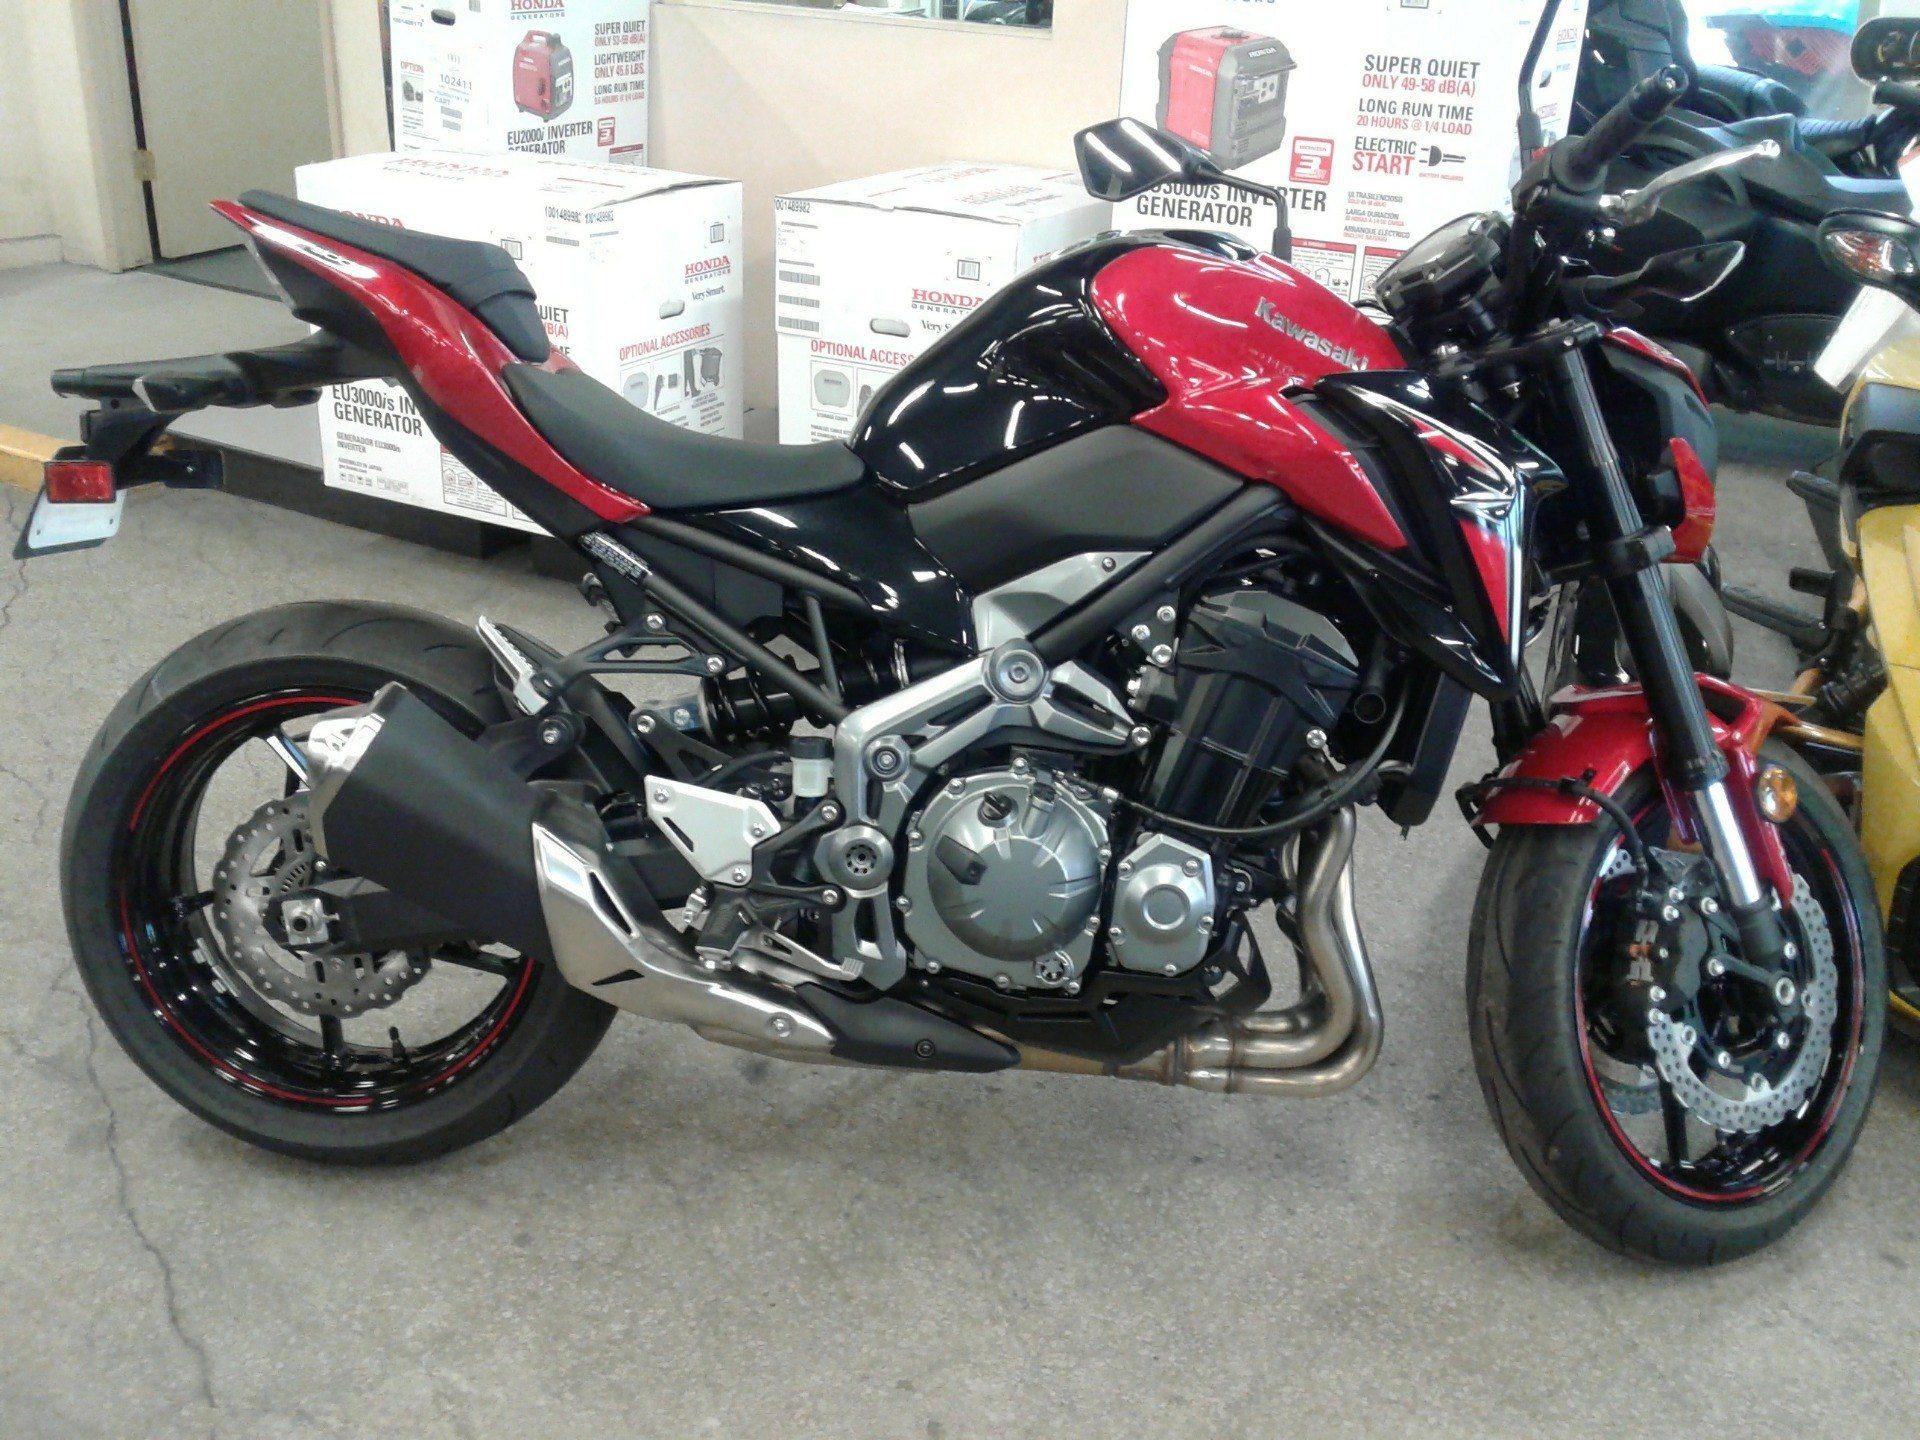 new 2018 kawasaki z900 abs motorcycles in bakersfield ca. Black Bedroom Furniture Sets. Home Design Ideas